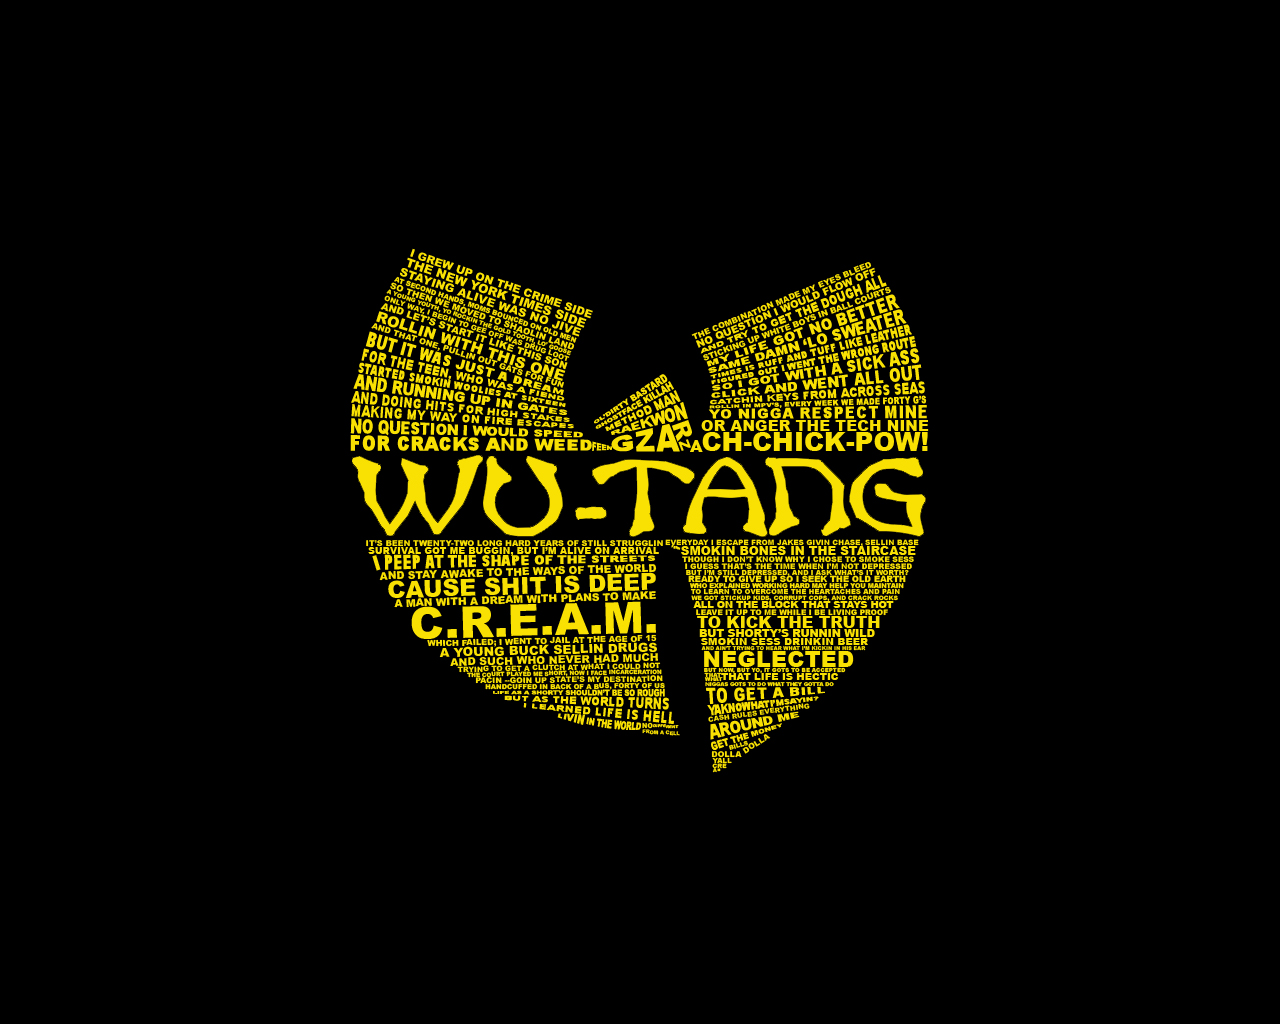 http://3.bp.blogspot.com/_jOz15O5-Unc/TRitEg9T4_I/AAAAAAAAADI/NlwUPAb8tww/s1600/Wu_Tang_Clan_Wallpaper_by_Feenster64.jpg